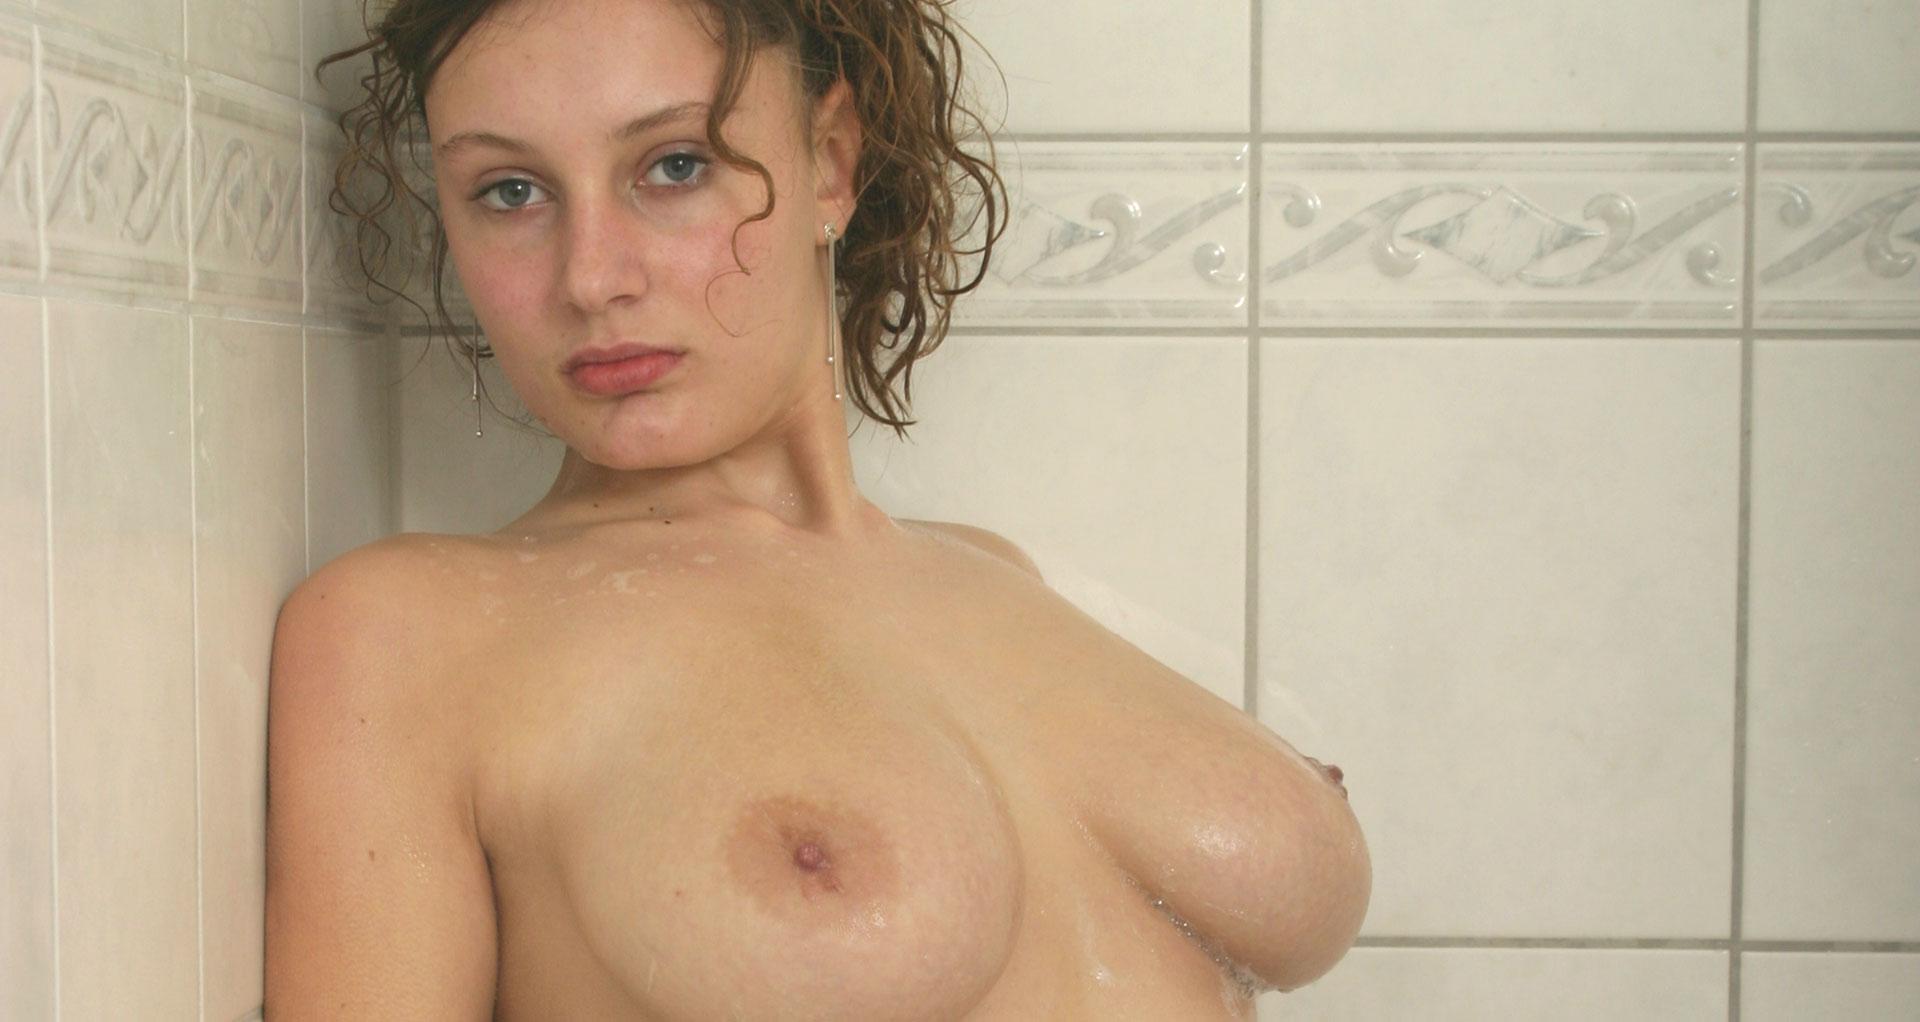 sextreff bremen erotik date köln